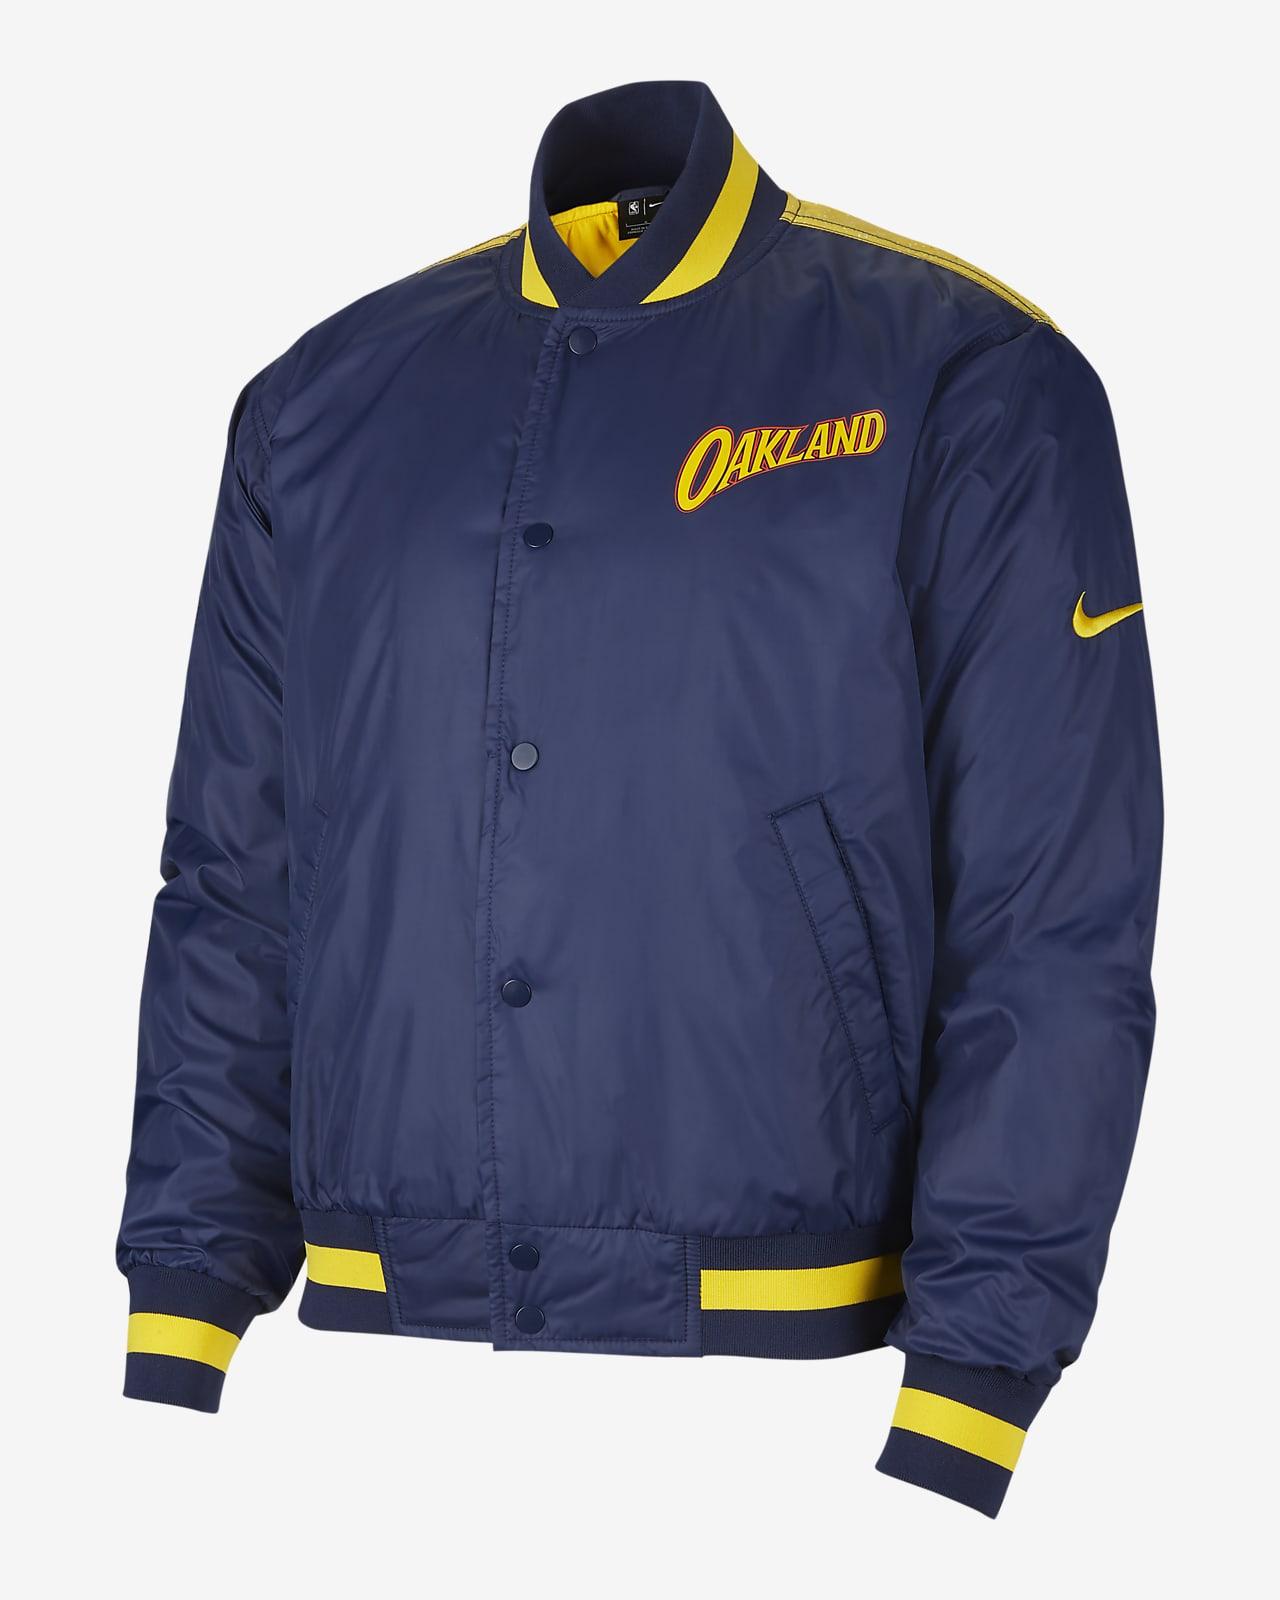 Golden State Warriors City Edition Courtside Men's Nike NBA Jacket